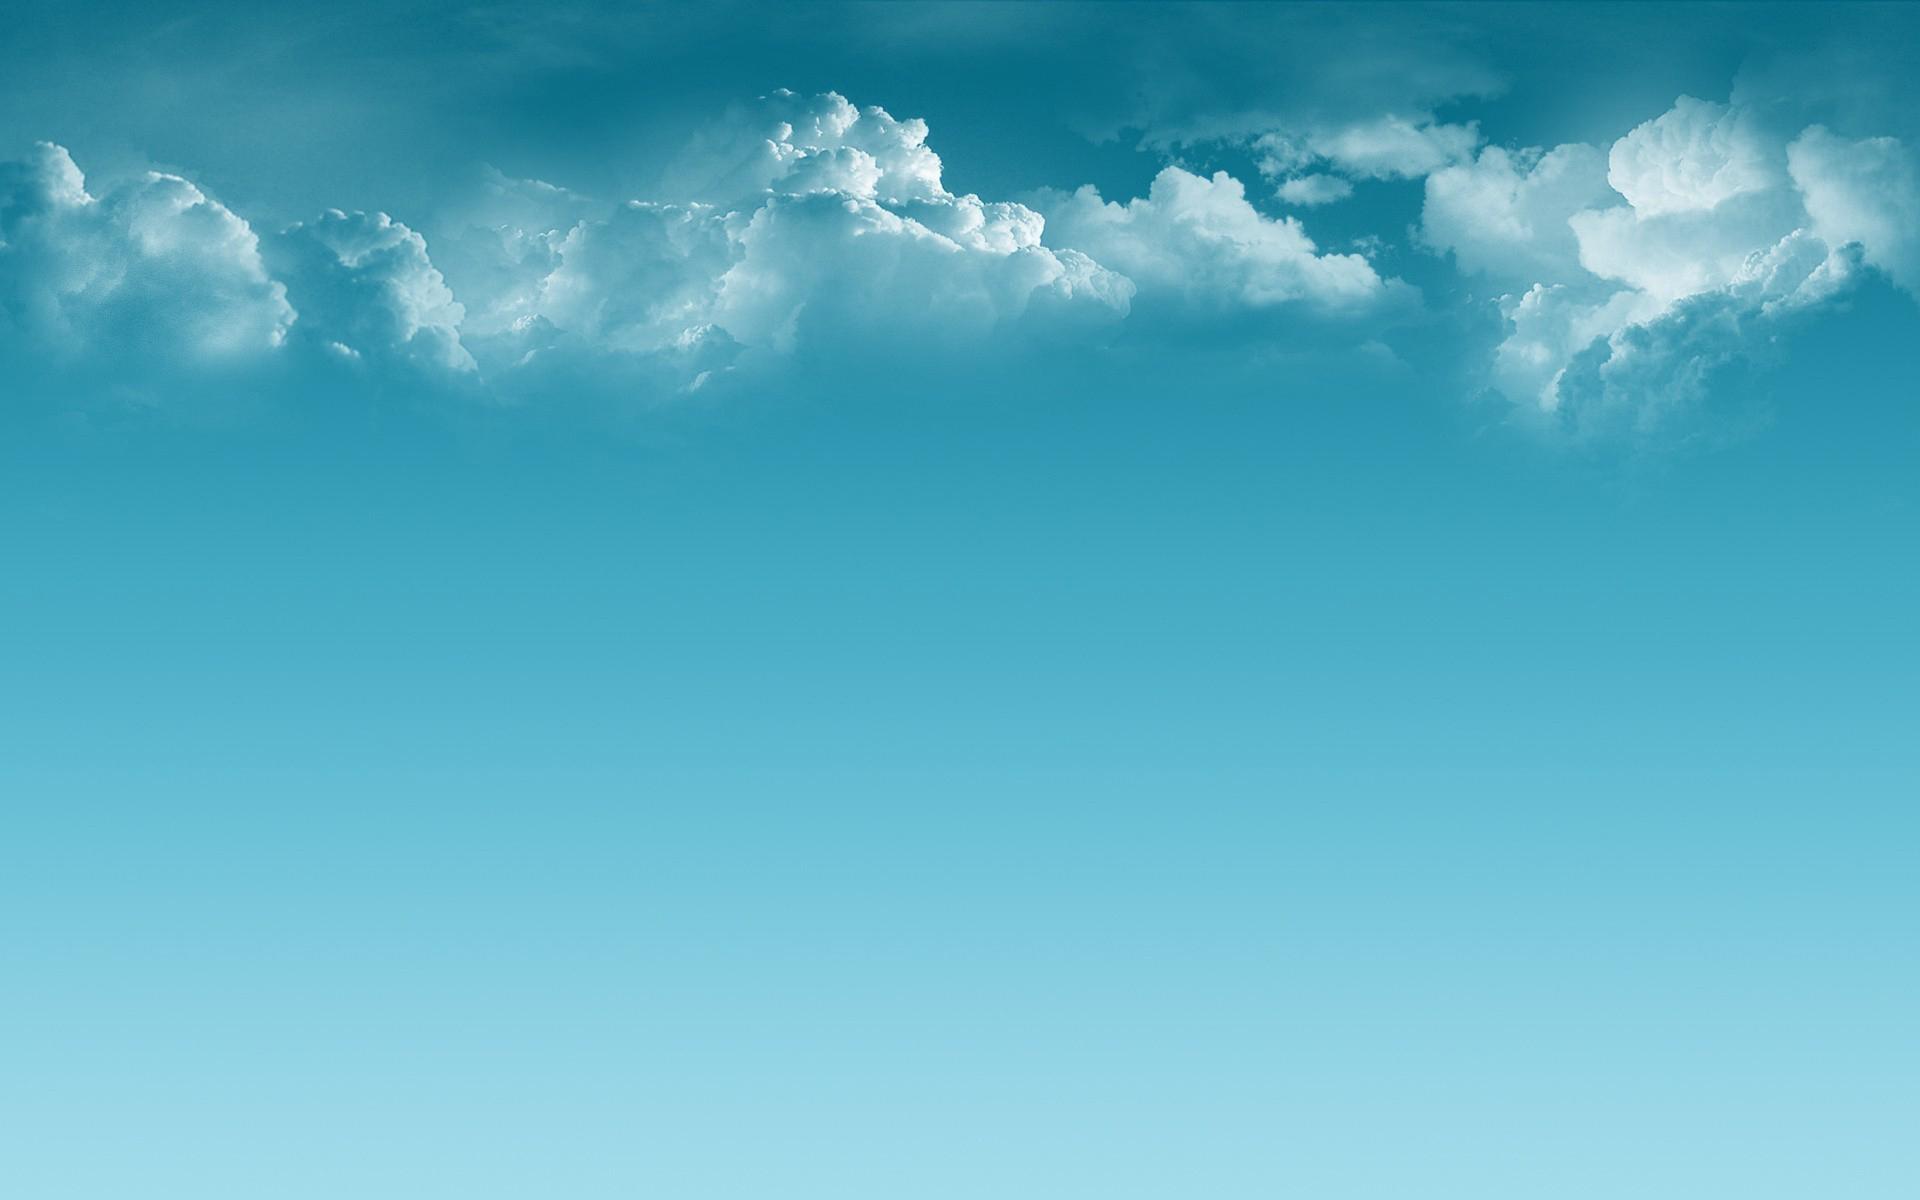 3d Wallpapers For Spring Desktop Sky Backgrounds Pixelstalk Net